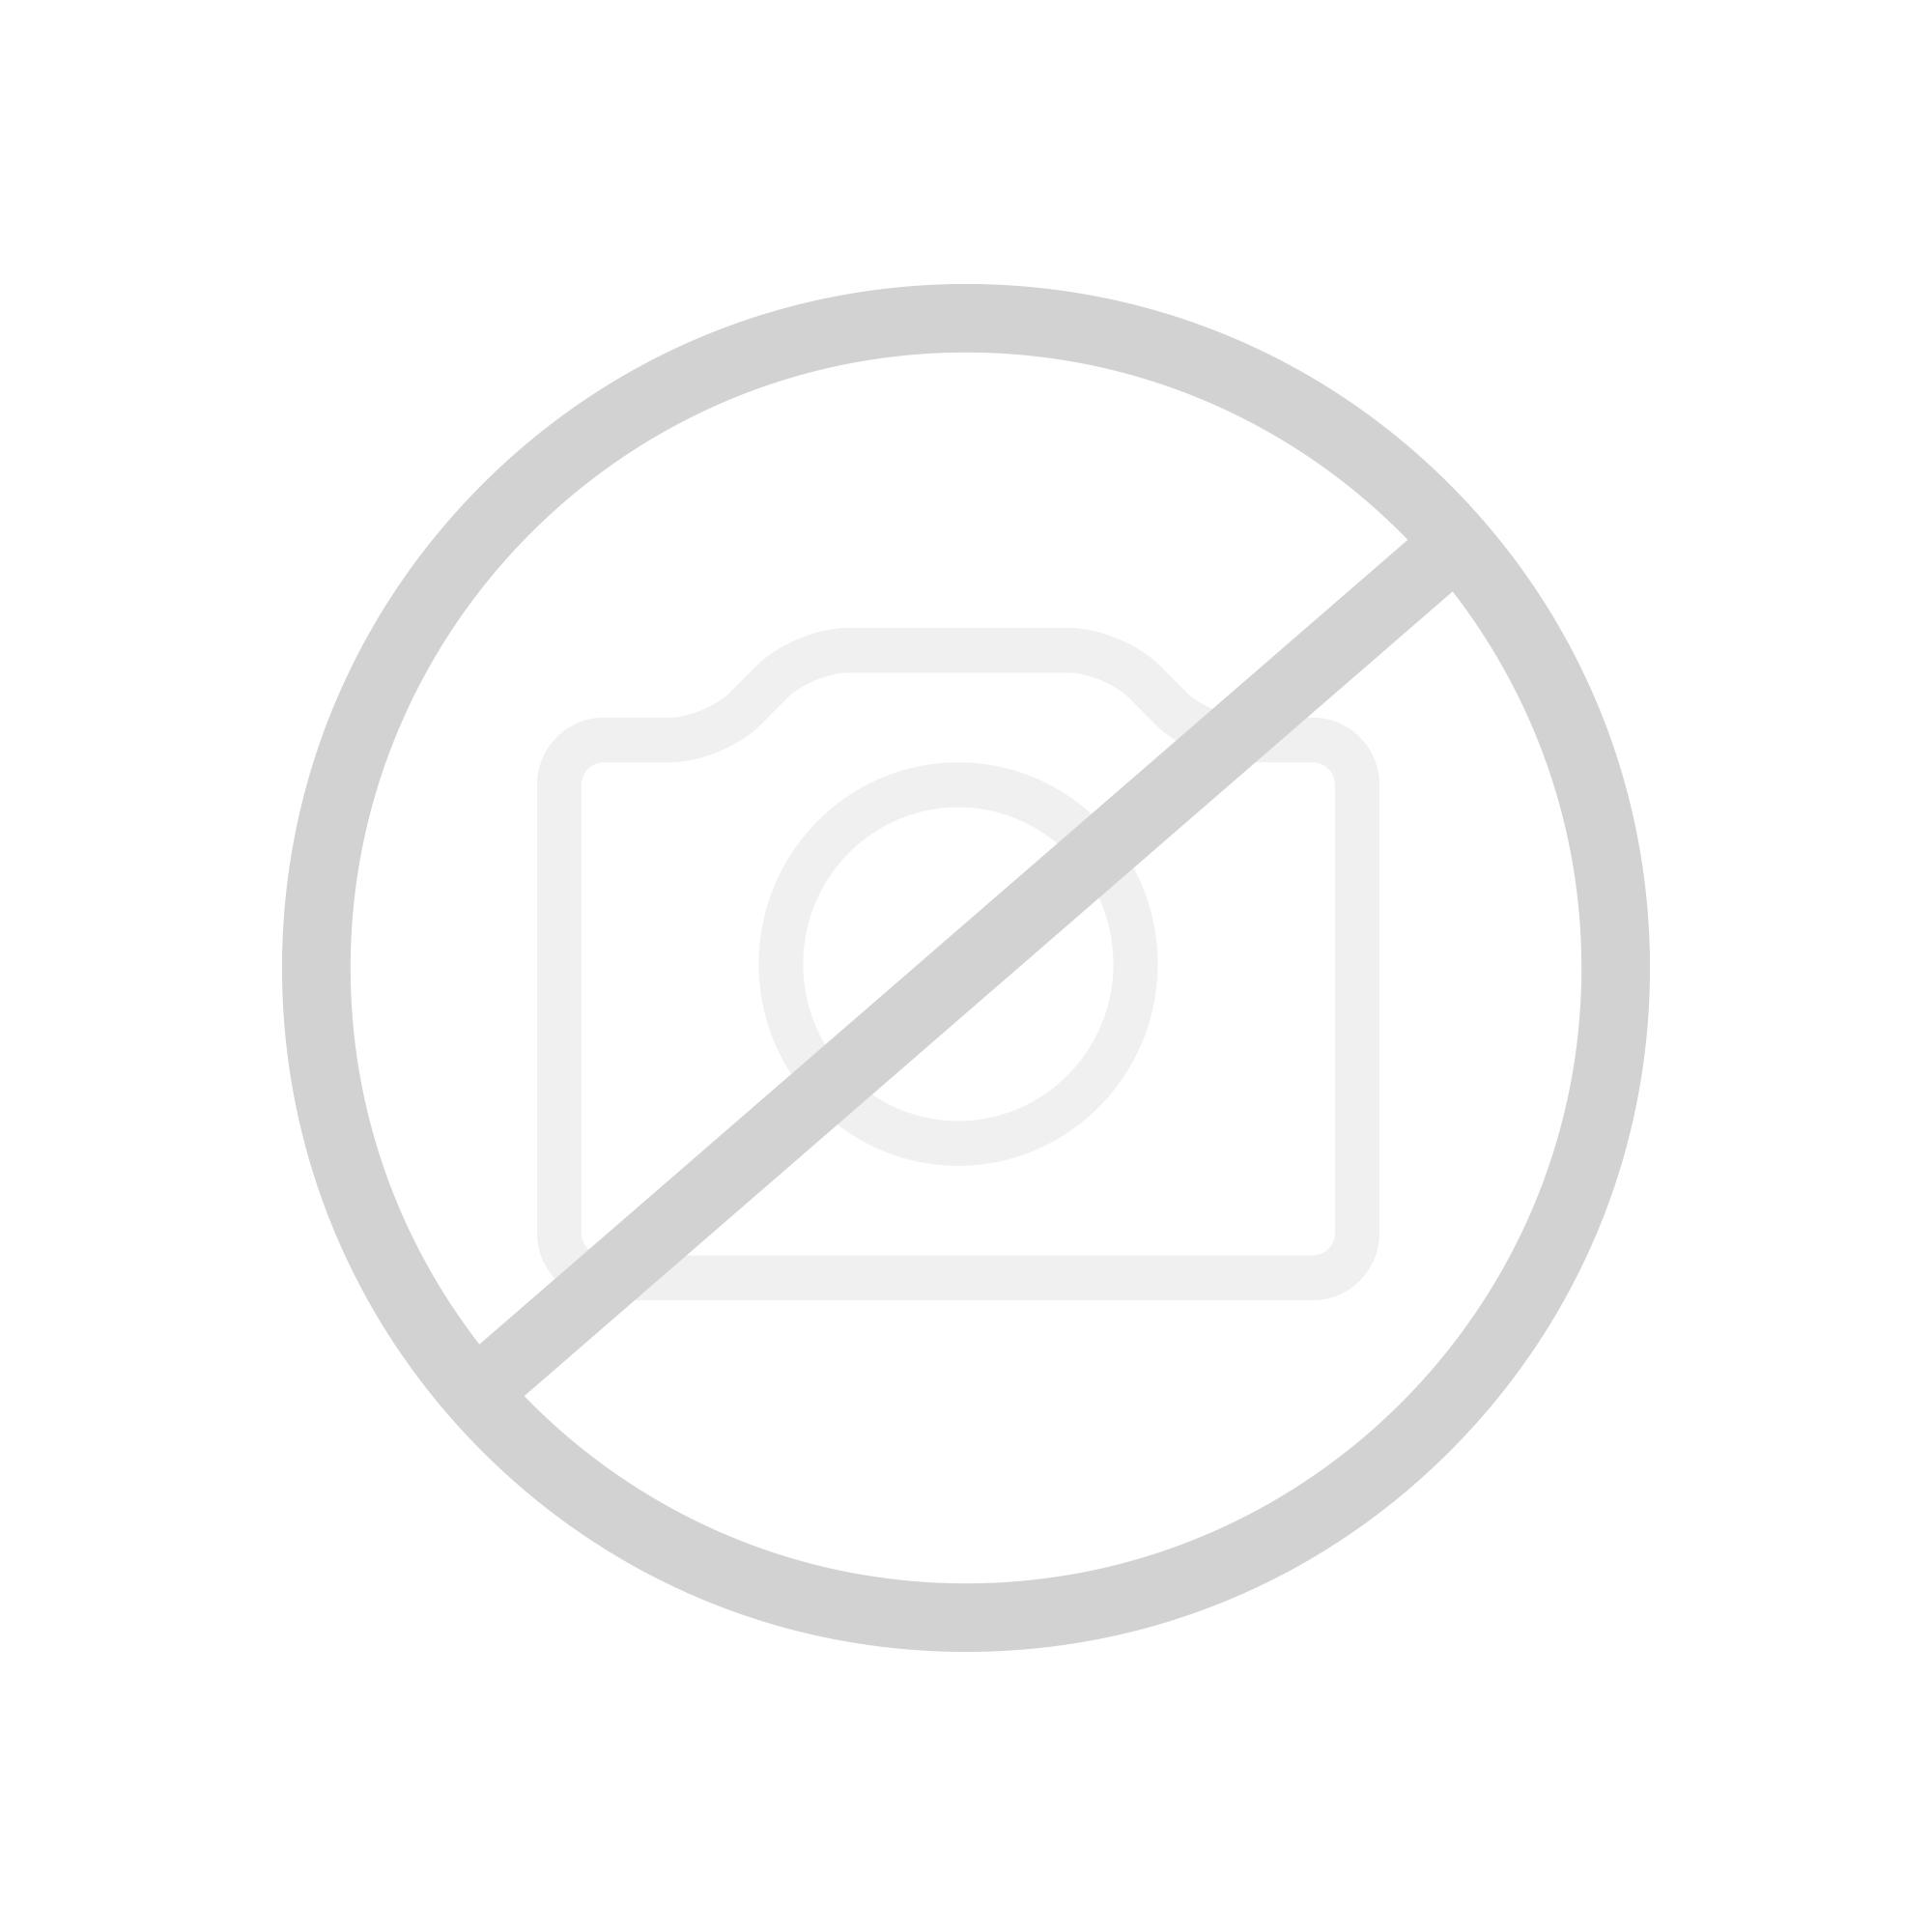 kaldewei puro rechteck badewanne wei perl effekt 259600013001 reuter onlineshop. Black Bedroom Furniture Sets. Home Design Ideas